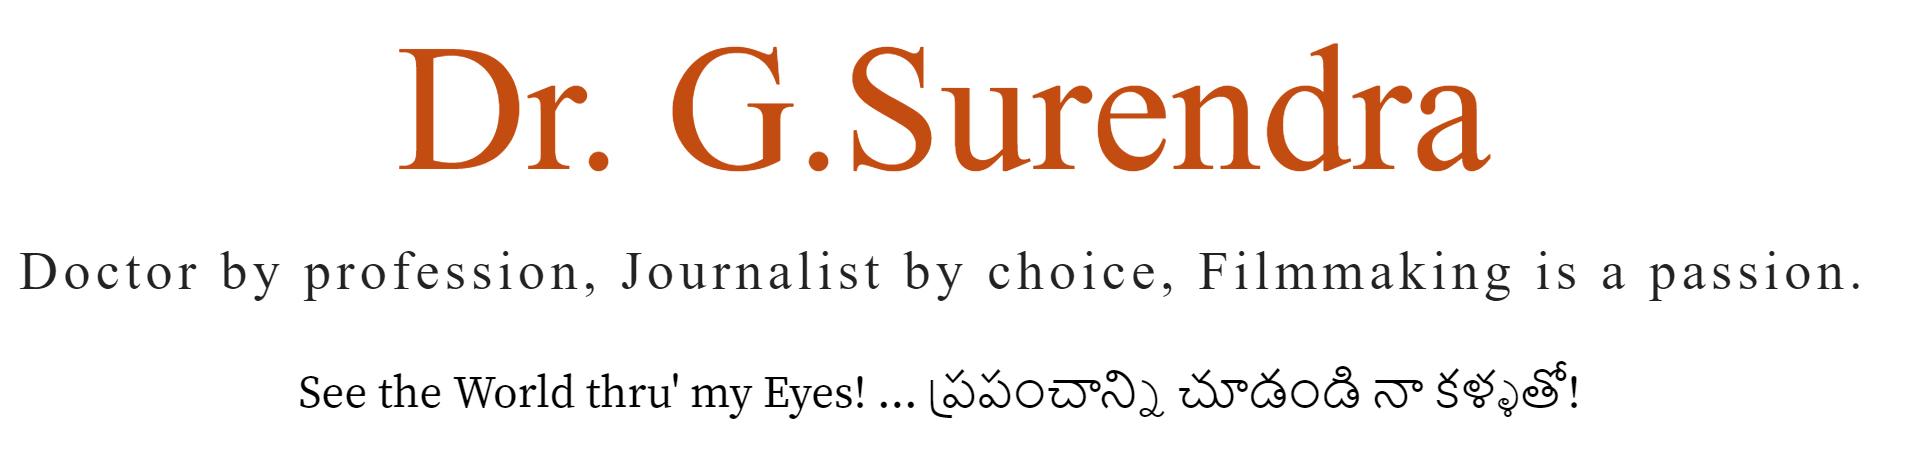 Dr.G.Surendra